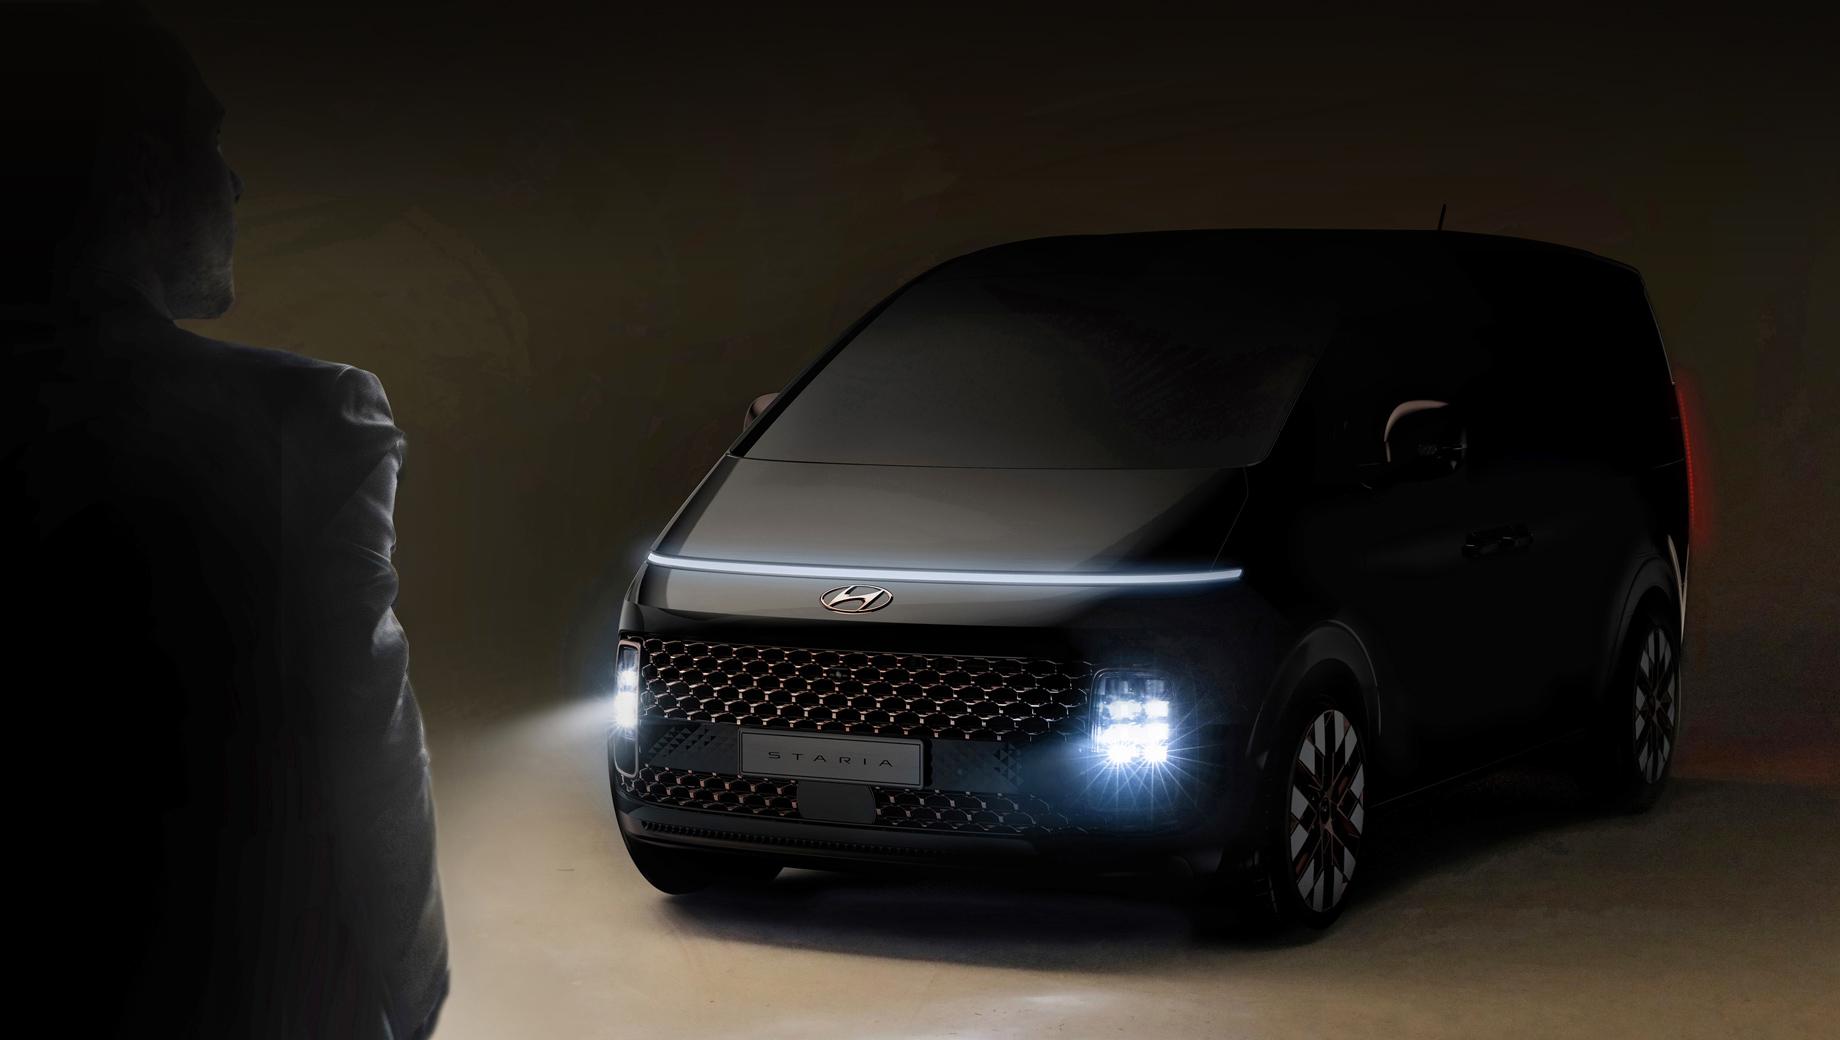 Минивэн Hyundai Staria объявлен компанией футуристичным